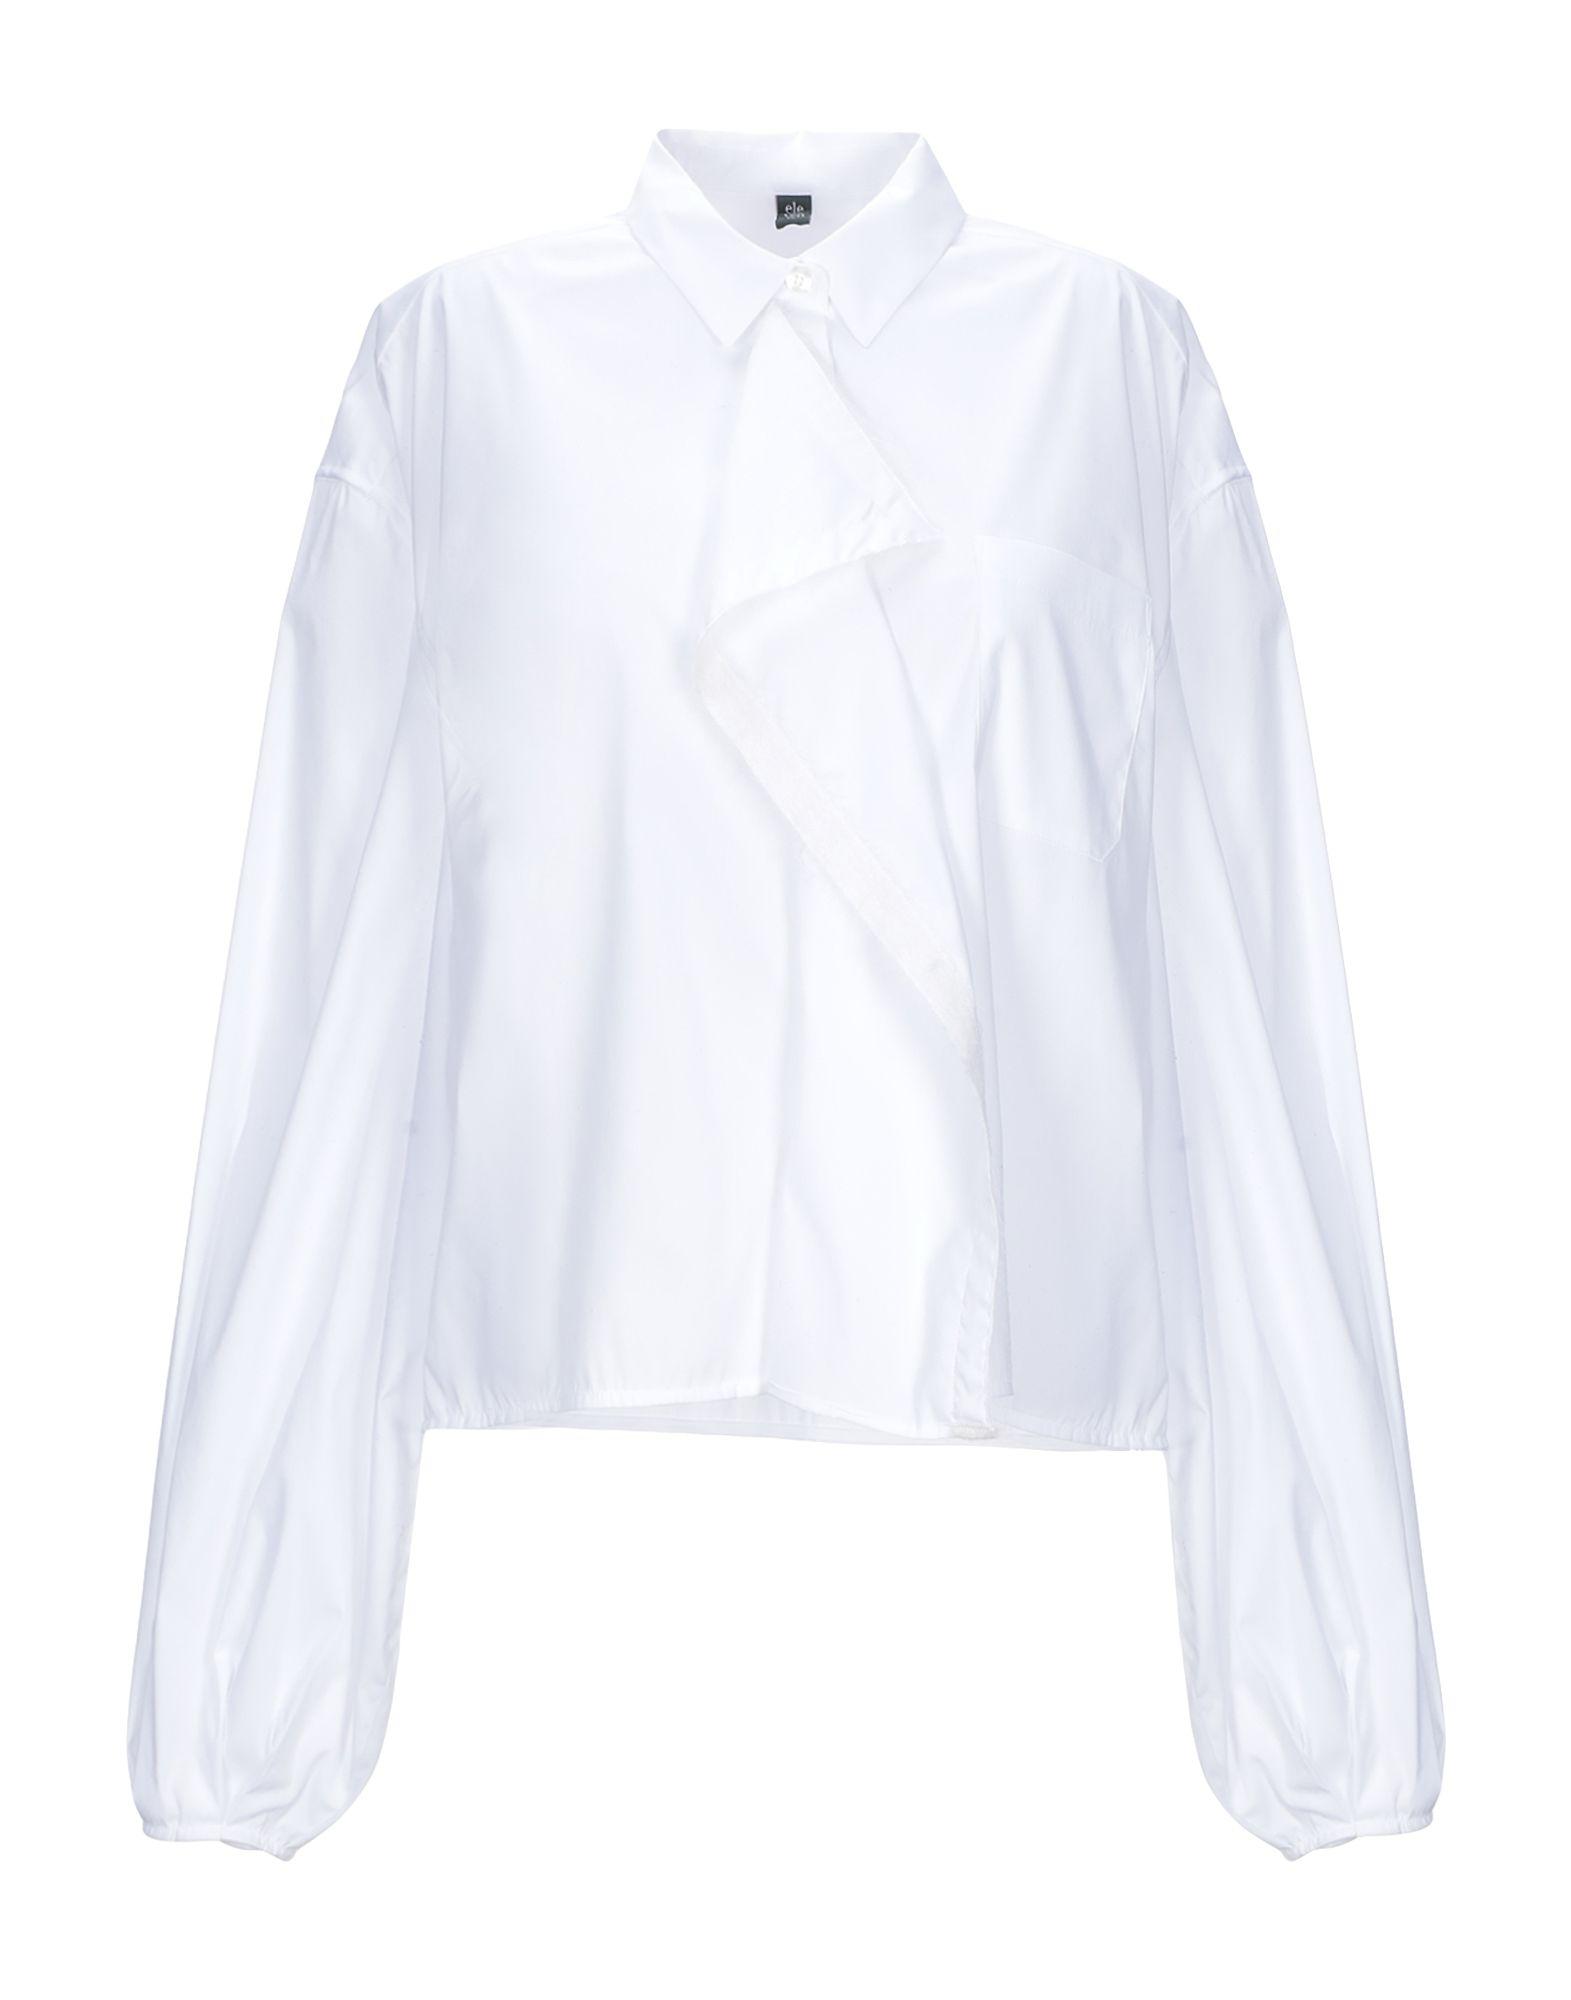 Camicie E bluse Tinta Unita Eleventy Eleventy Eleventy donna - 38849021JF 653